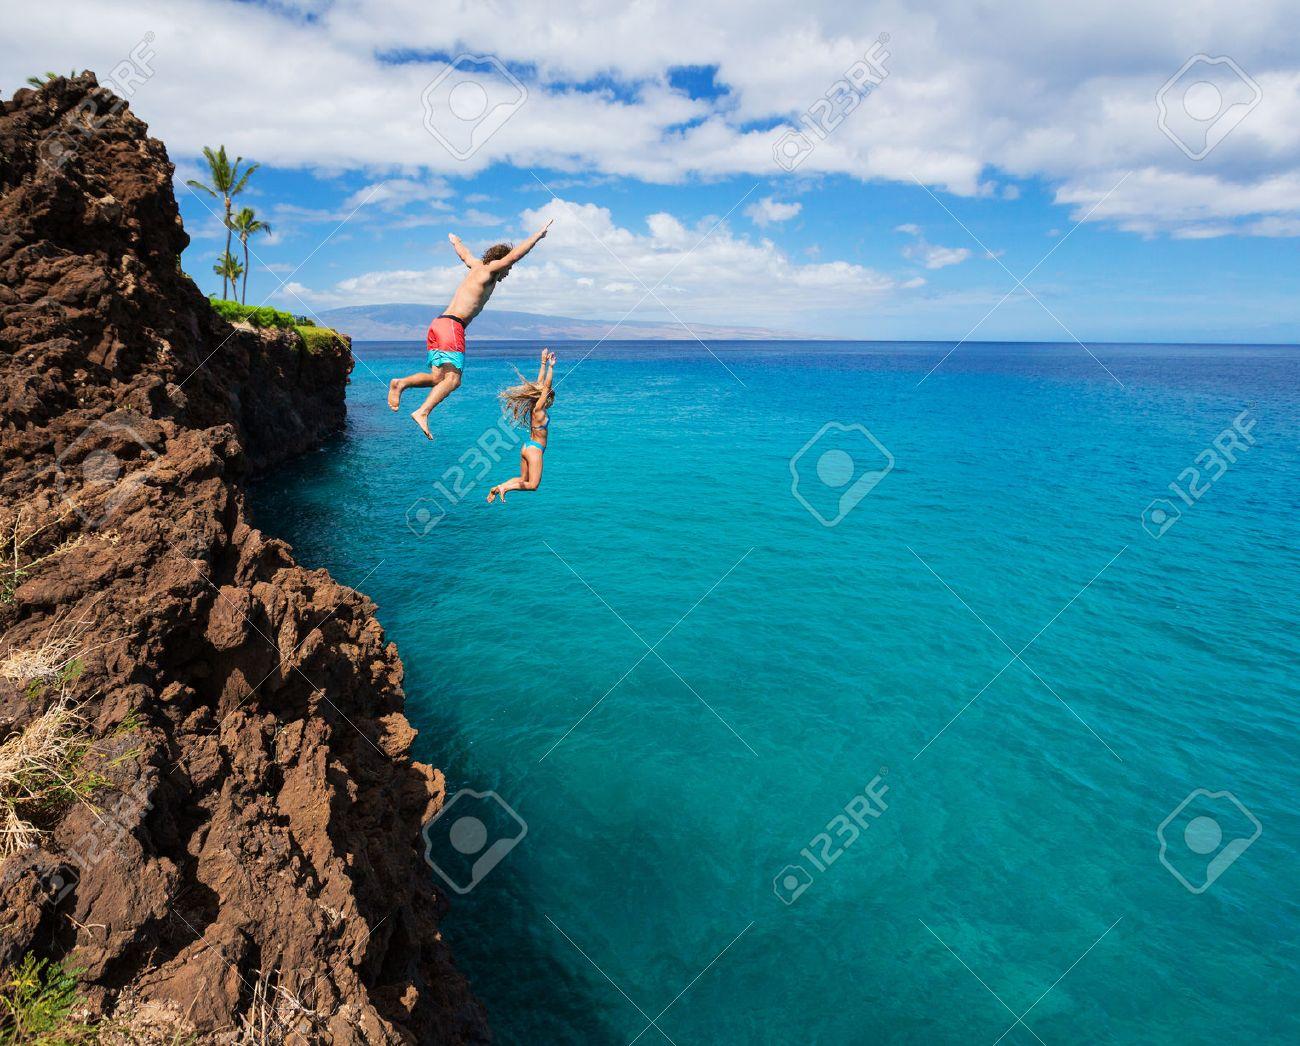 Summer fun, Friends cliff jumping into the ocean. - 30193394